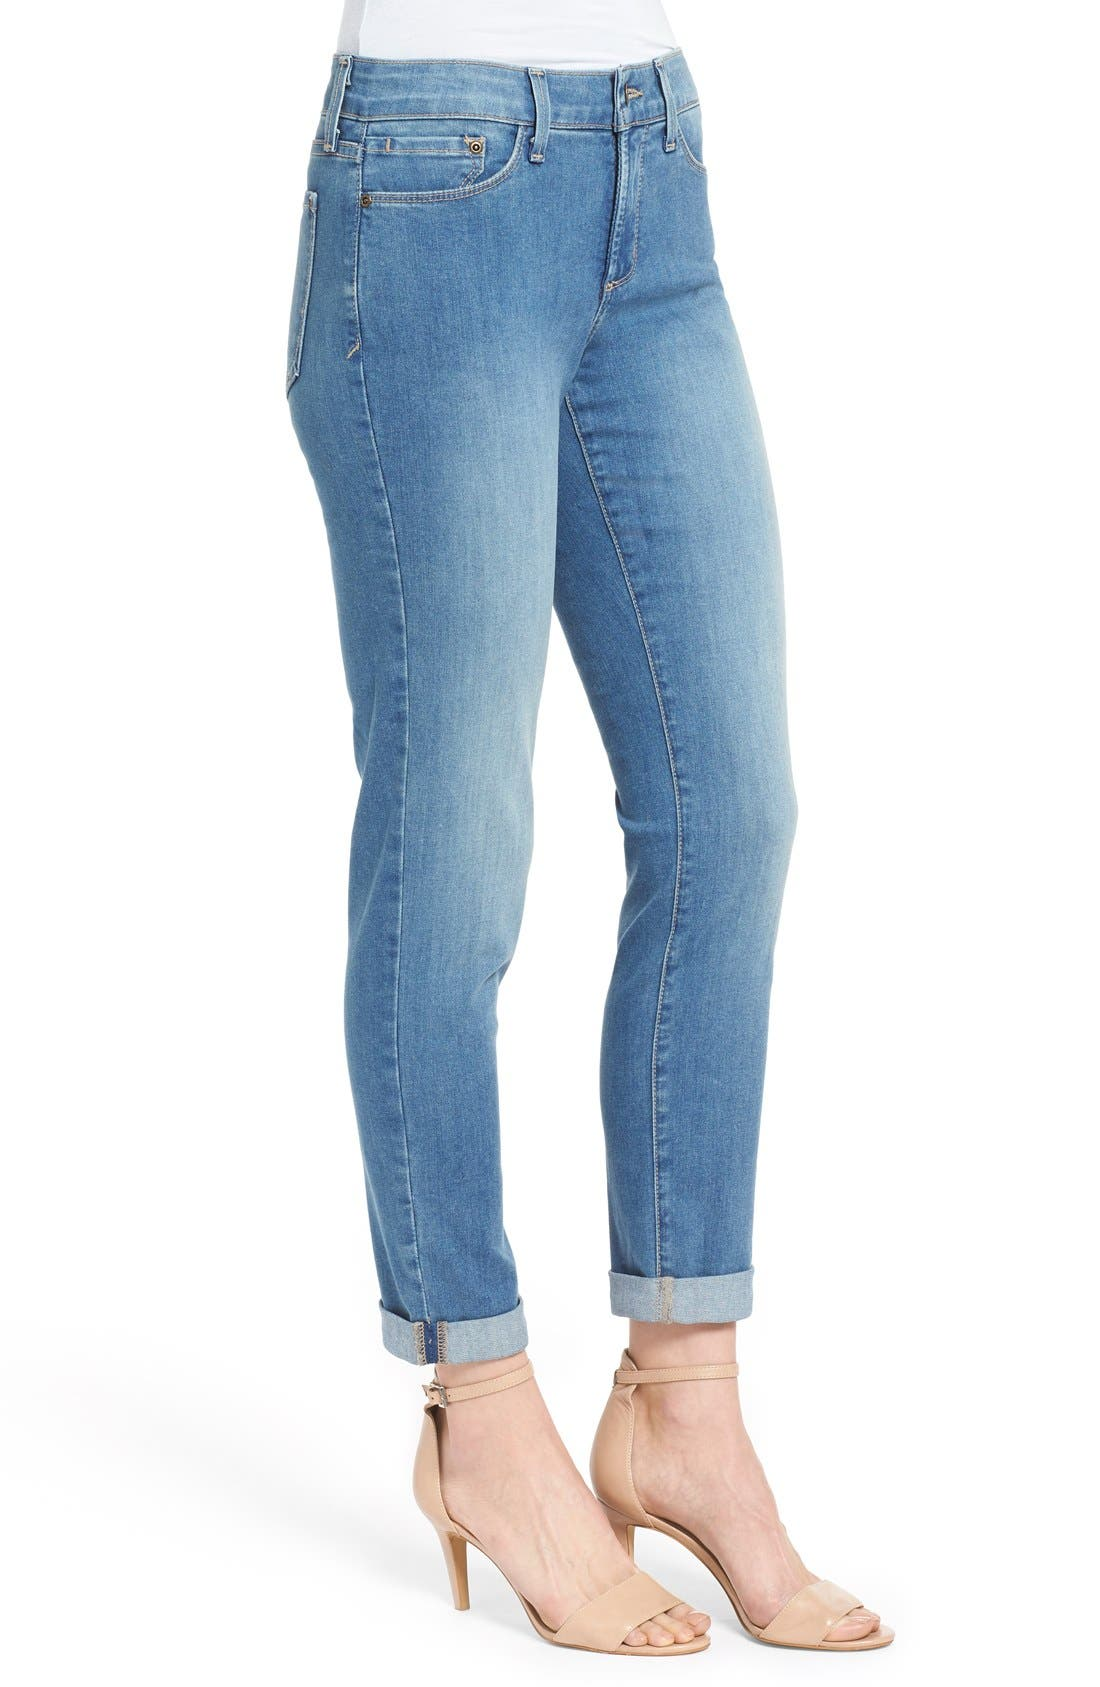 Alternate Image 3  - NYDJ 'Anabelle' Stretch Skinny Boyfriend Jeans (Upper Falls) (Regular & Petite)